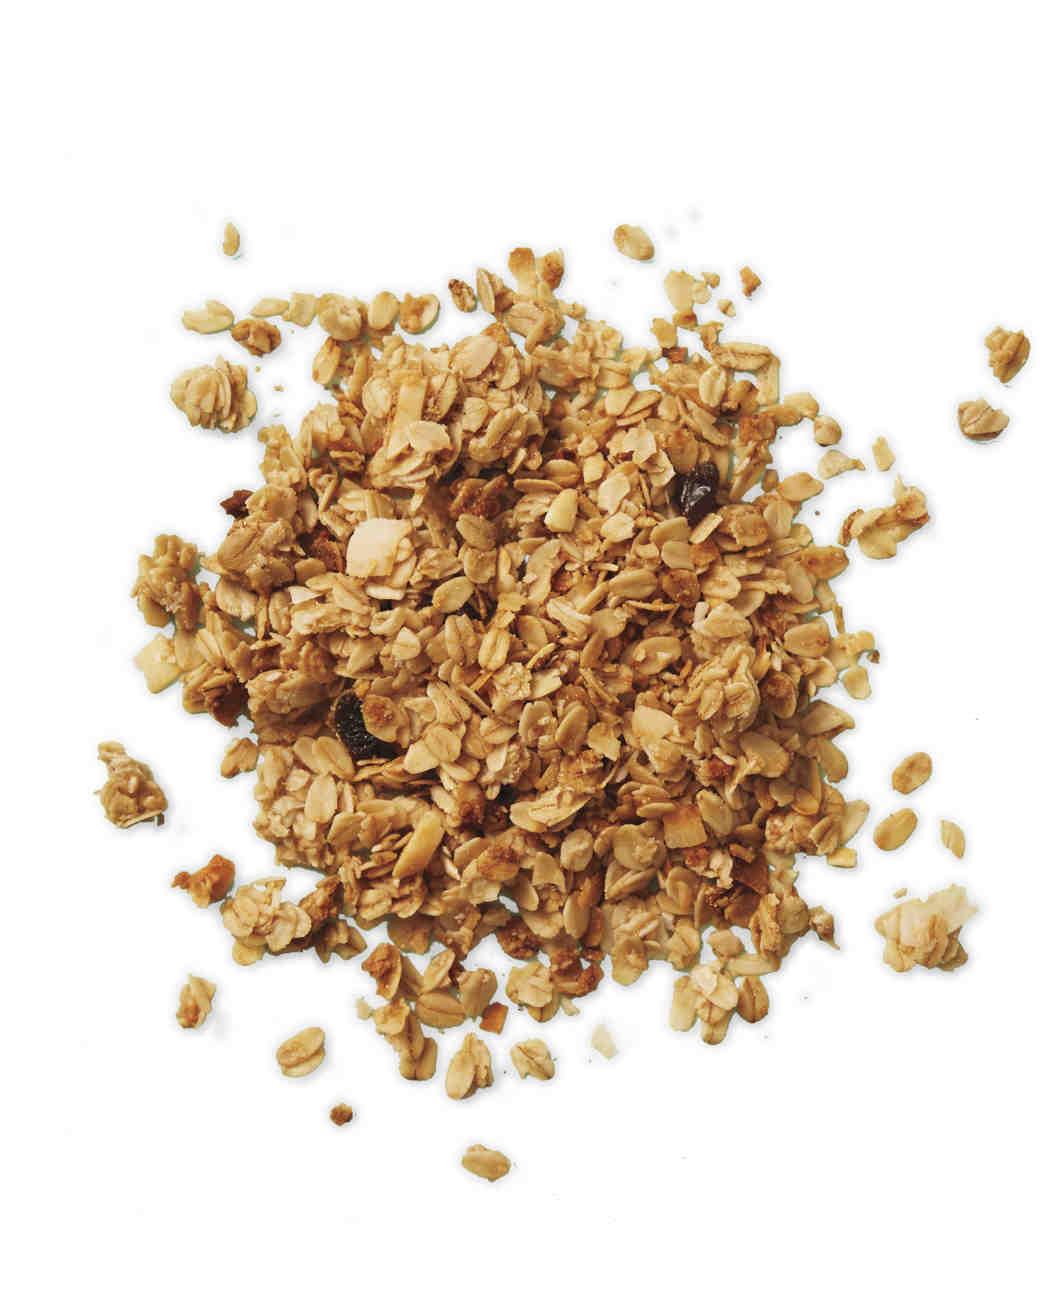 colorado-co-granola-325-d111965.jpg